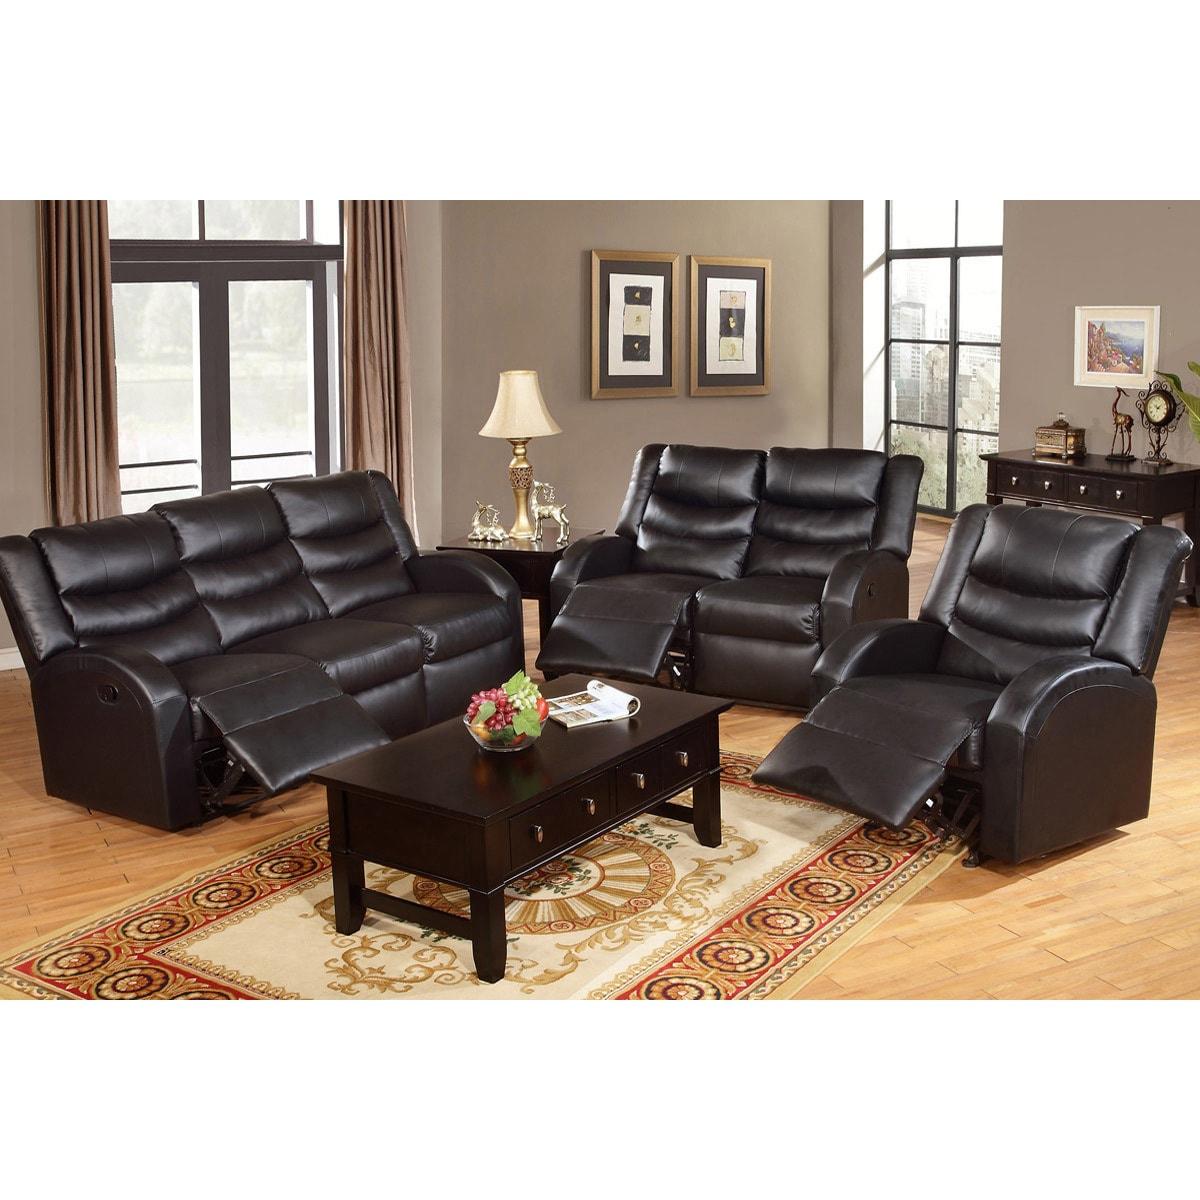 Rouen Bonded Leather Recliner Motion Living Room Set - Free ...